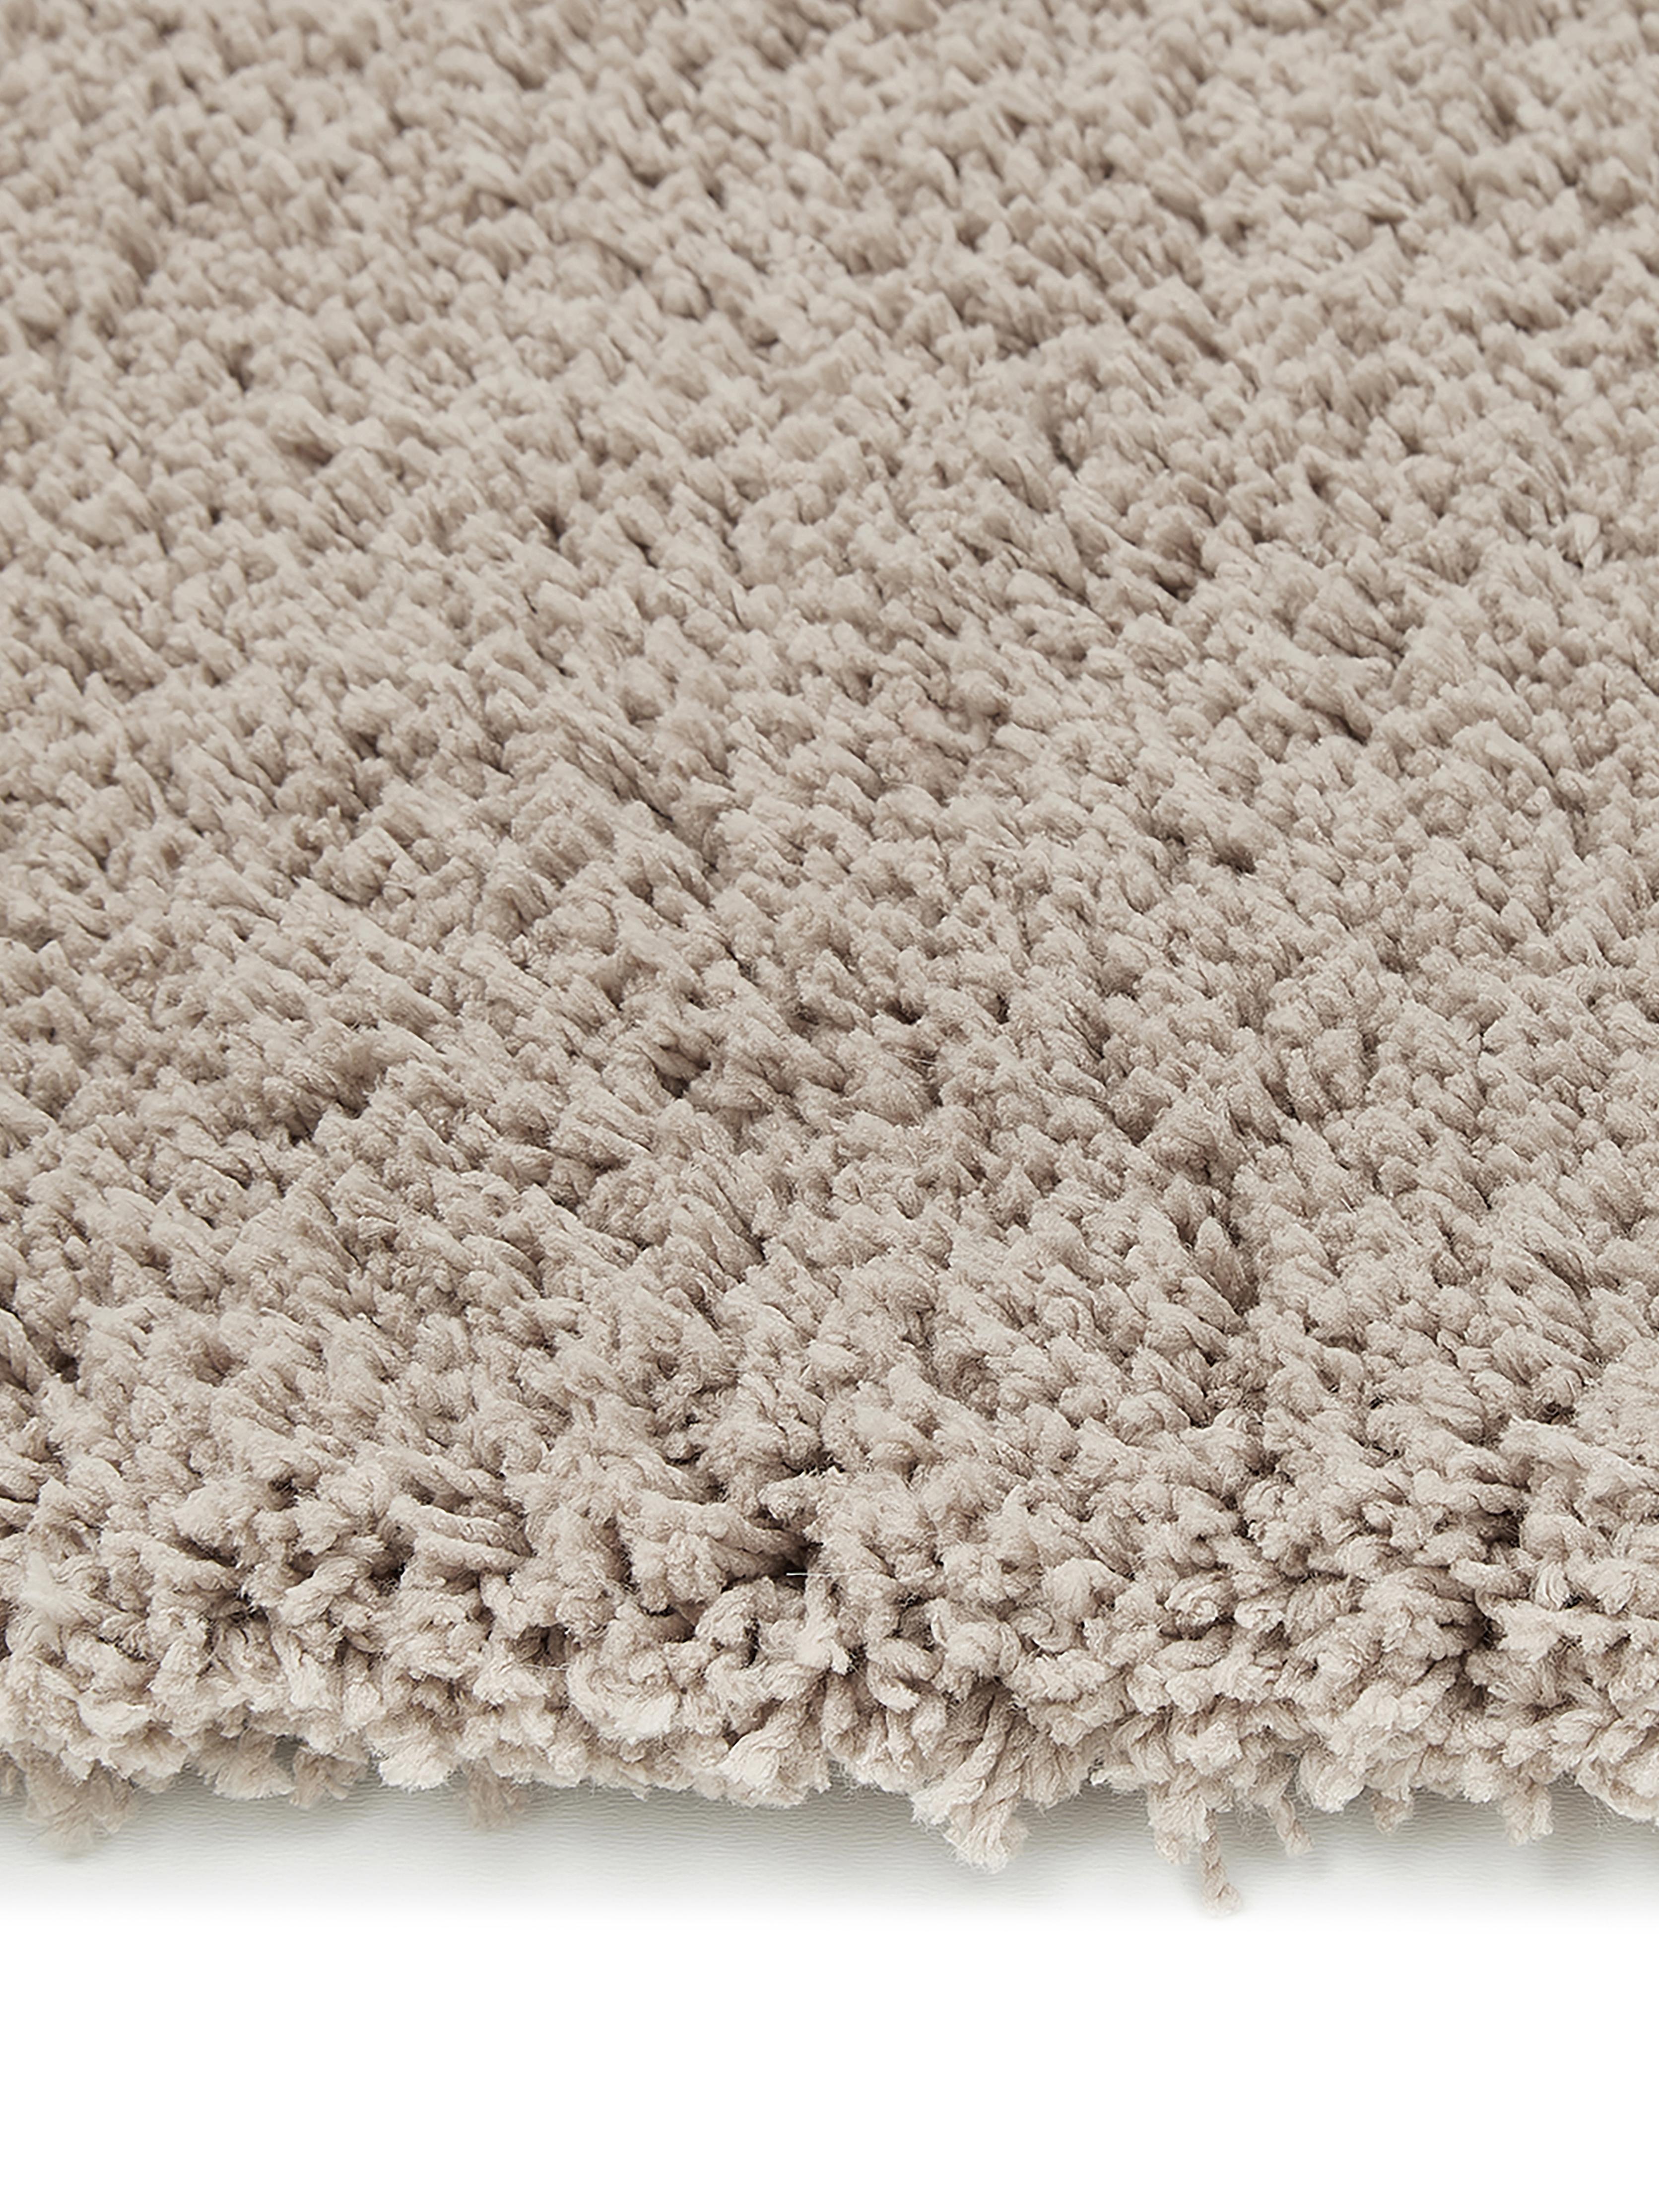 Huňatý koberec s vysokým vlasom Leighton, béžová, Béžová-hnedá